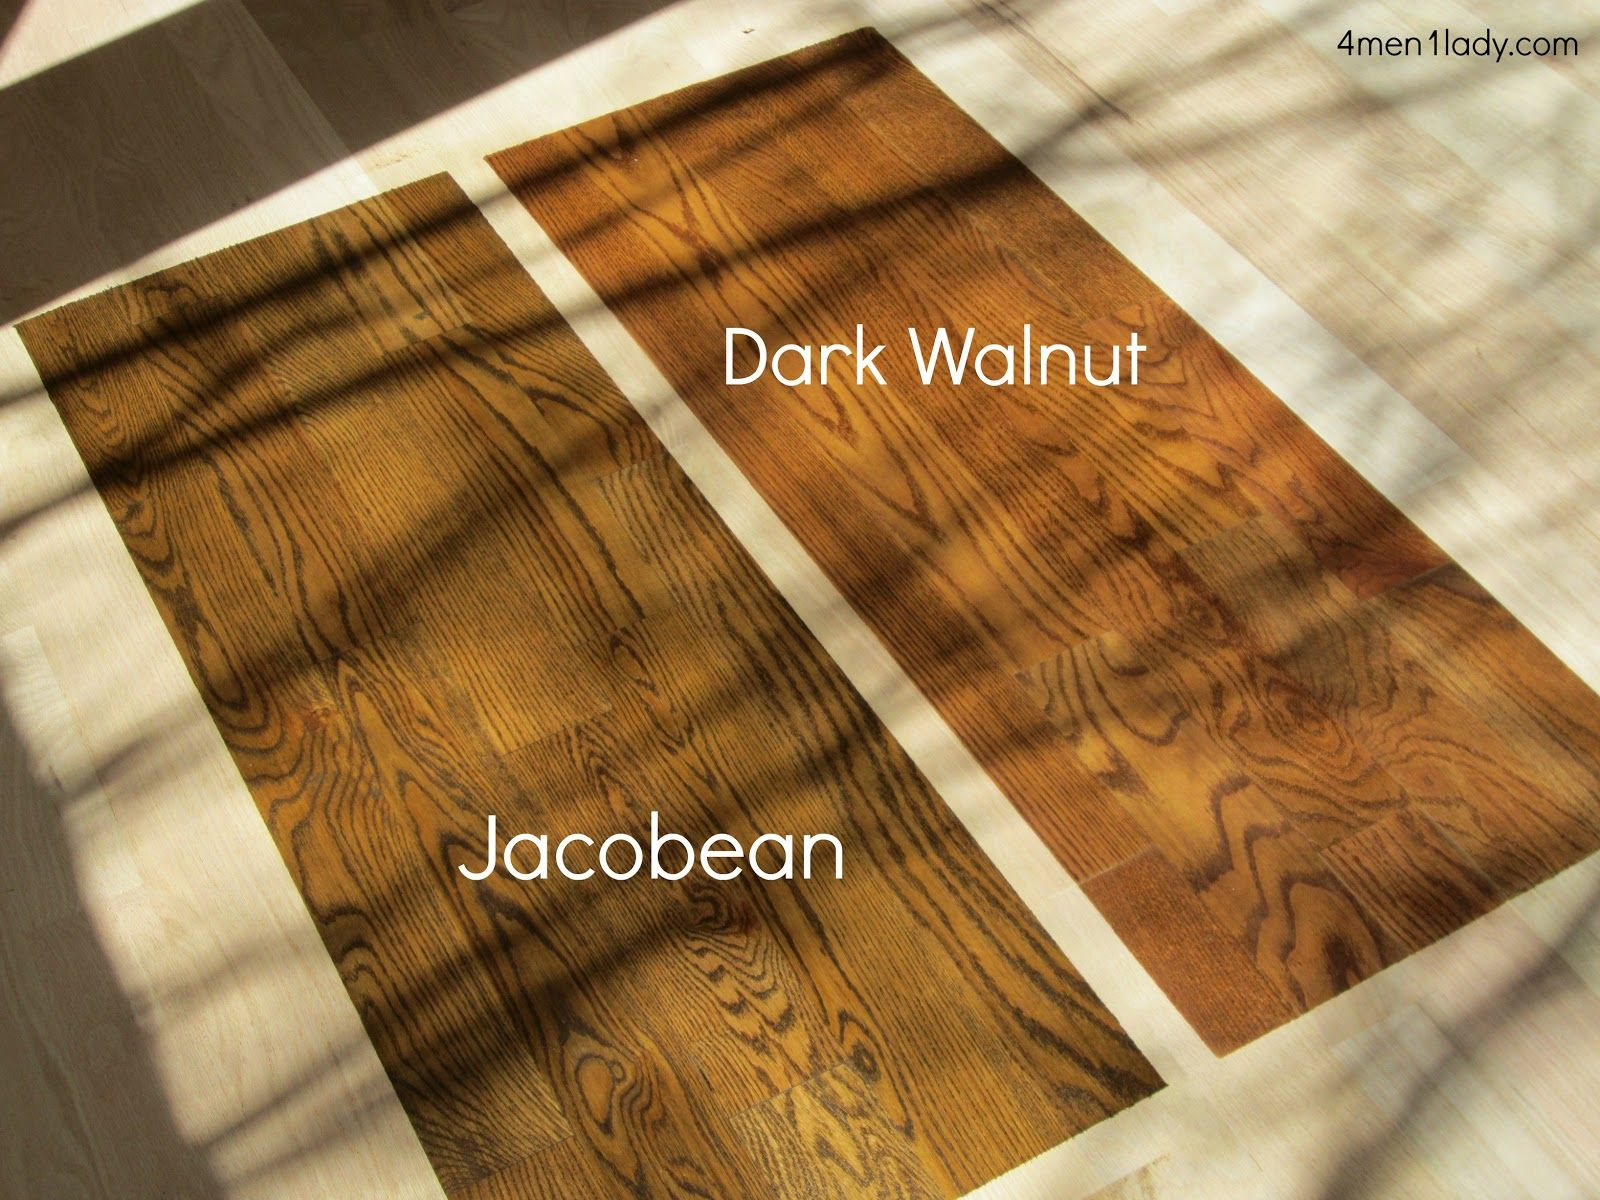 Jacobean Vs Dark Walnut Google Search Paint Colours In